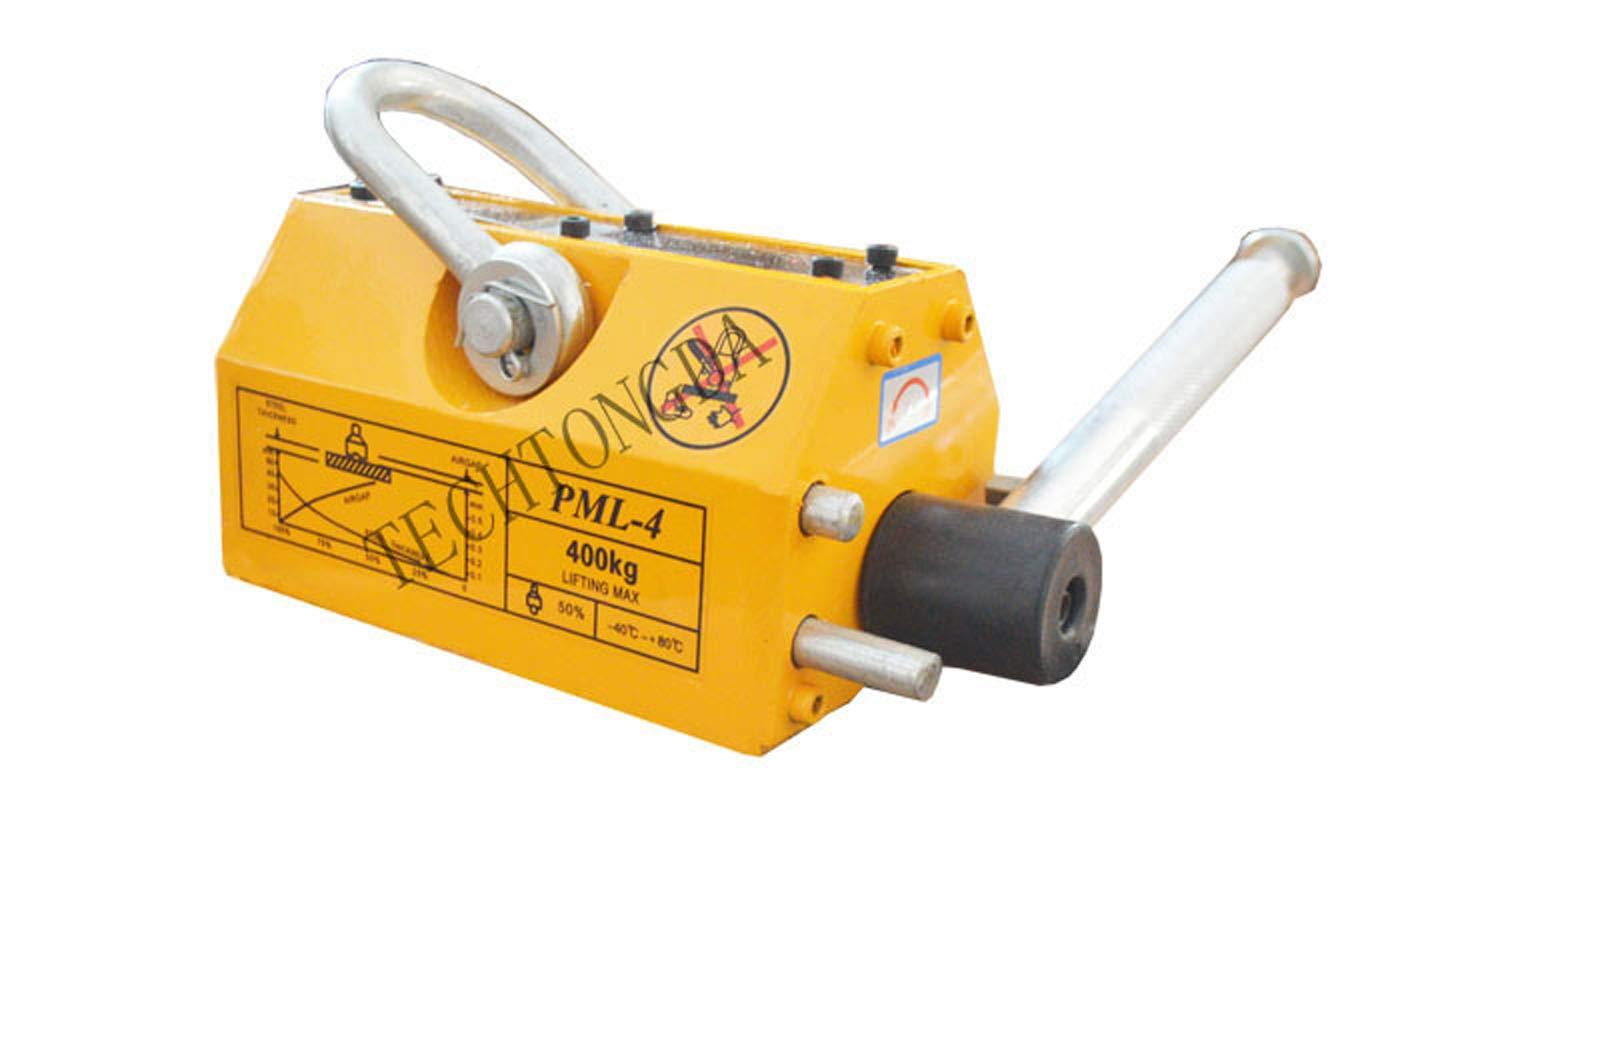 INTBUYING 400KG Steel Magnetic Lifter Heavy Duty Crane Hoist Neodymium Magnet